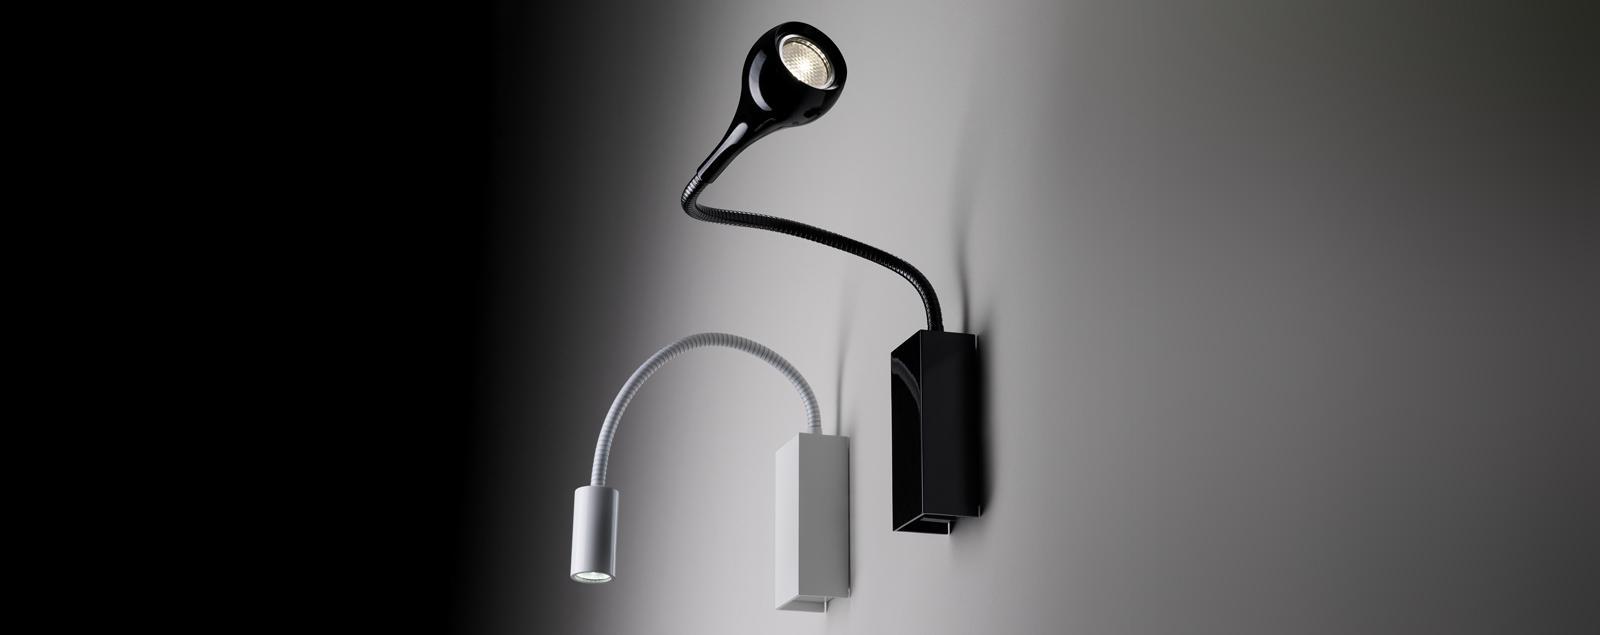 D75 Bijou wall lamp - Fabbian Illuminazione